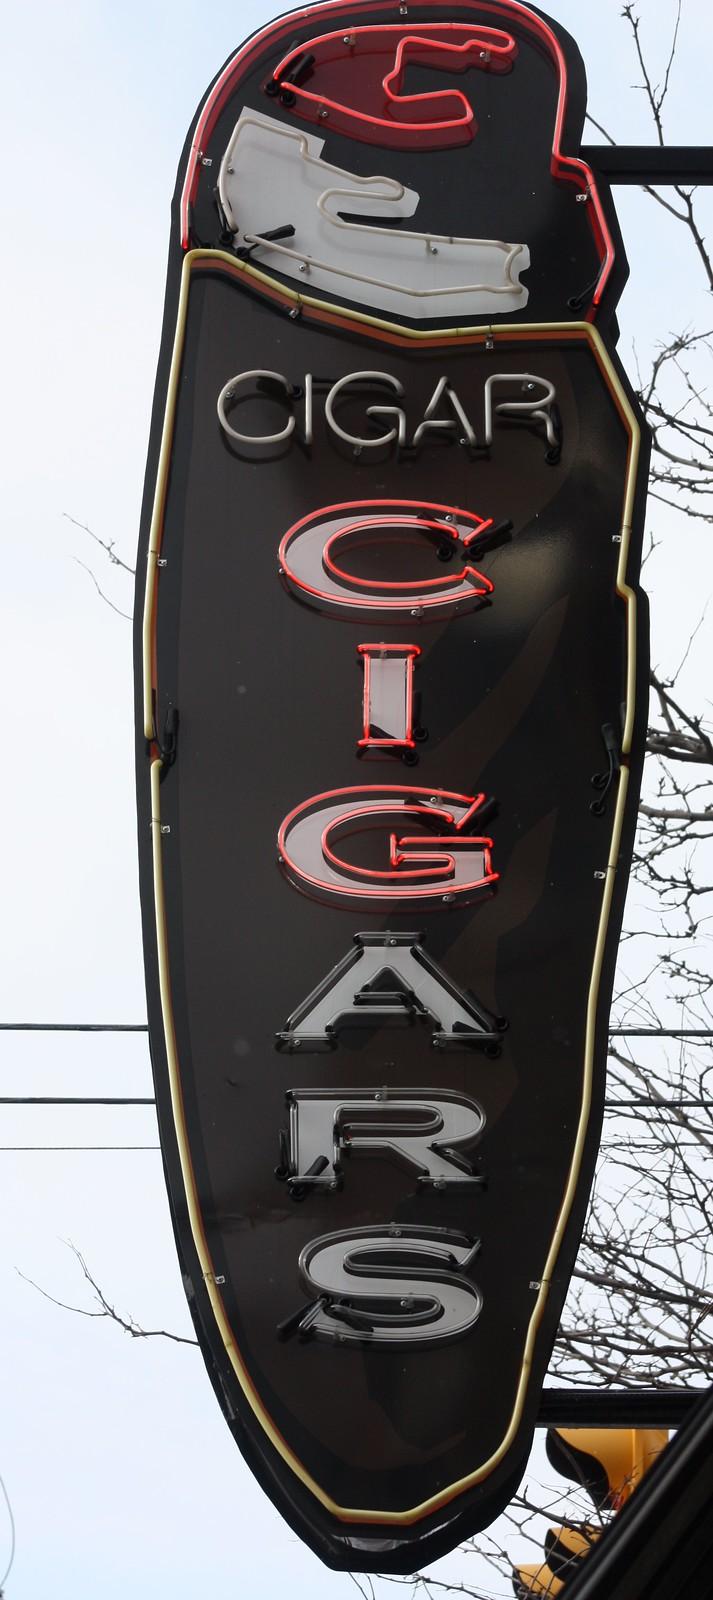 Cigar Sign